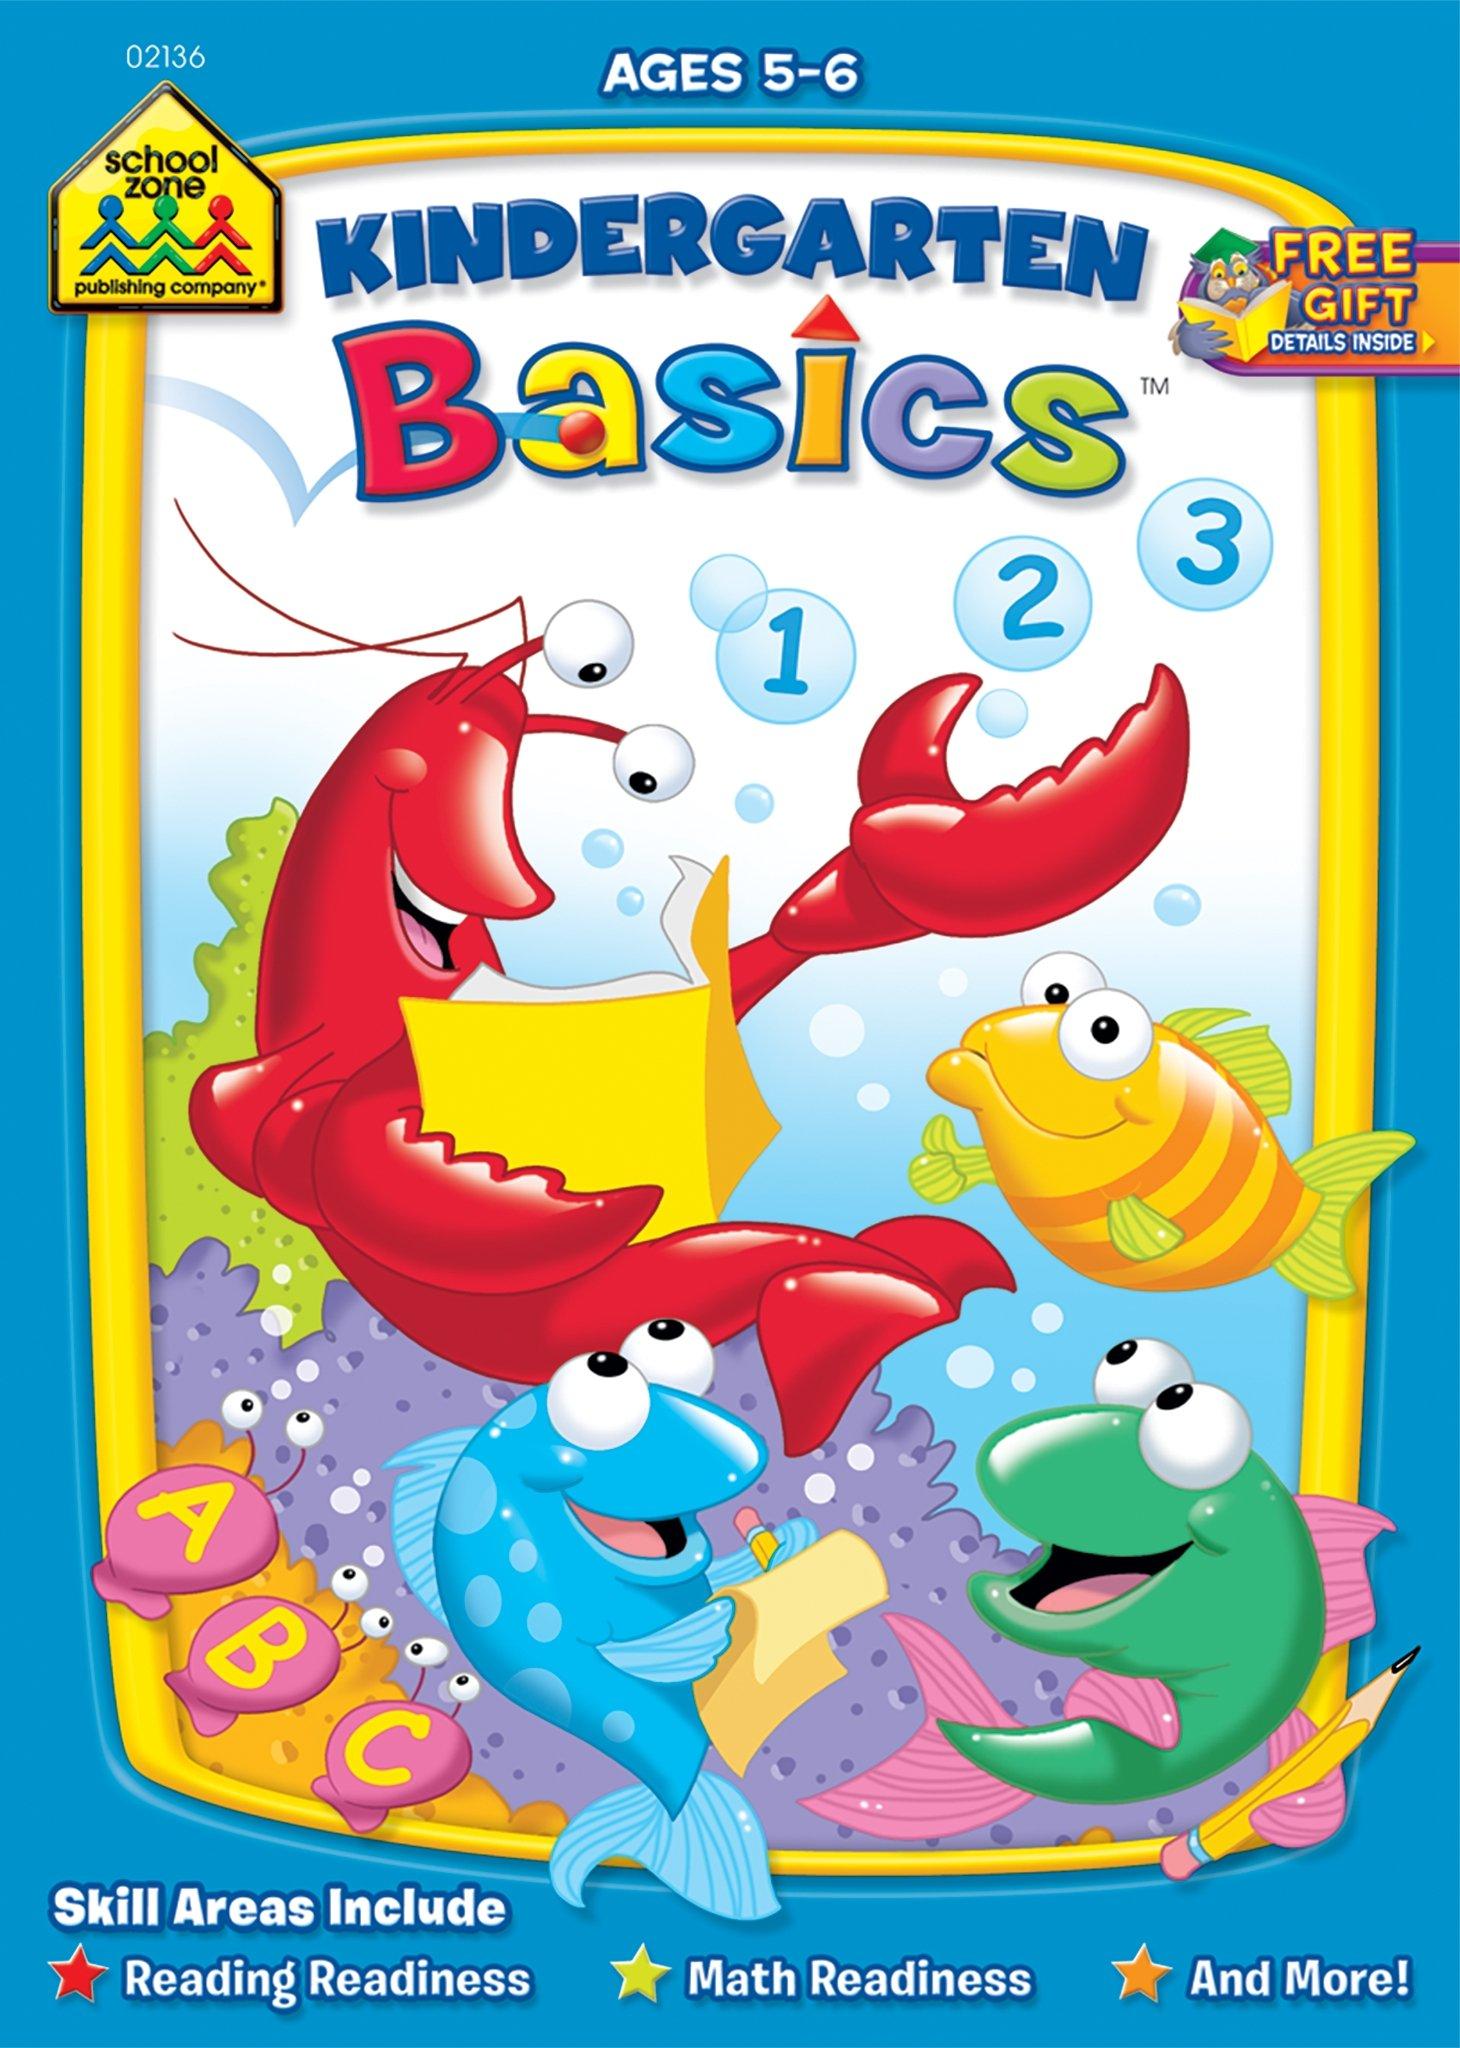 Download Kindergarten Basics Workbook Ages 5-6 ebook